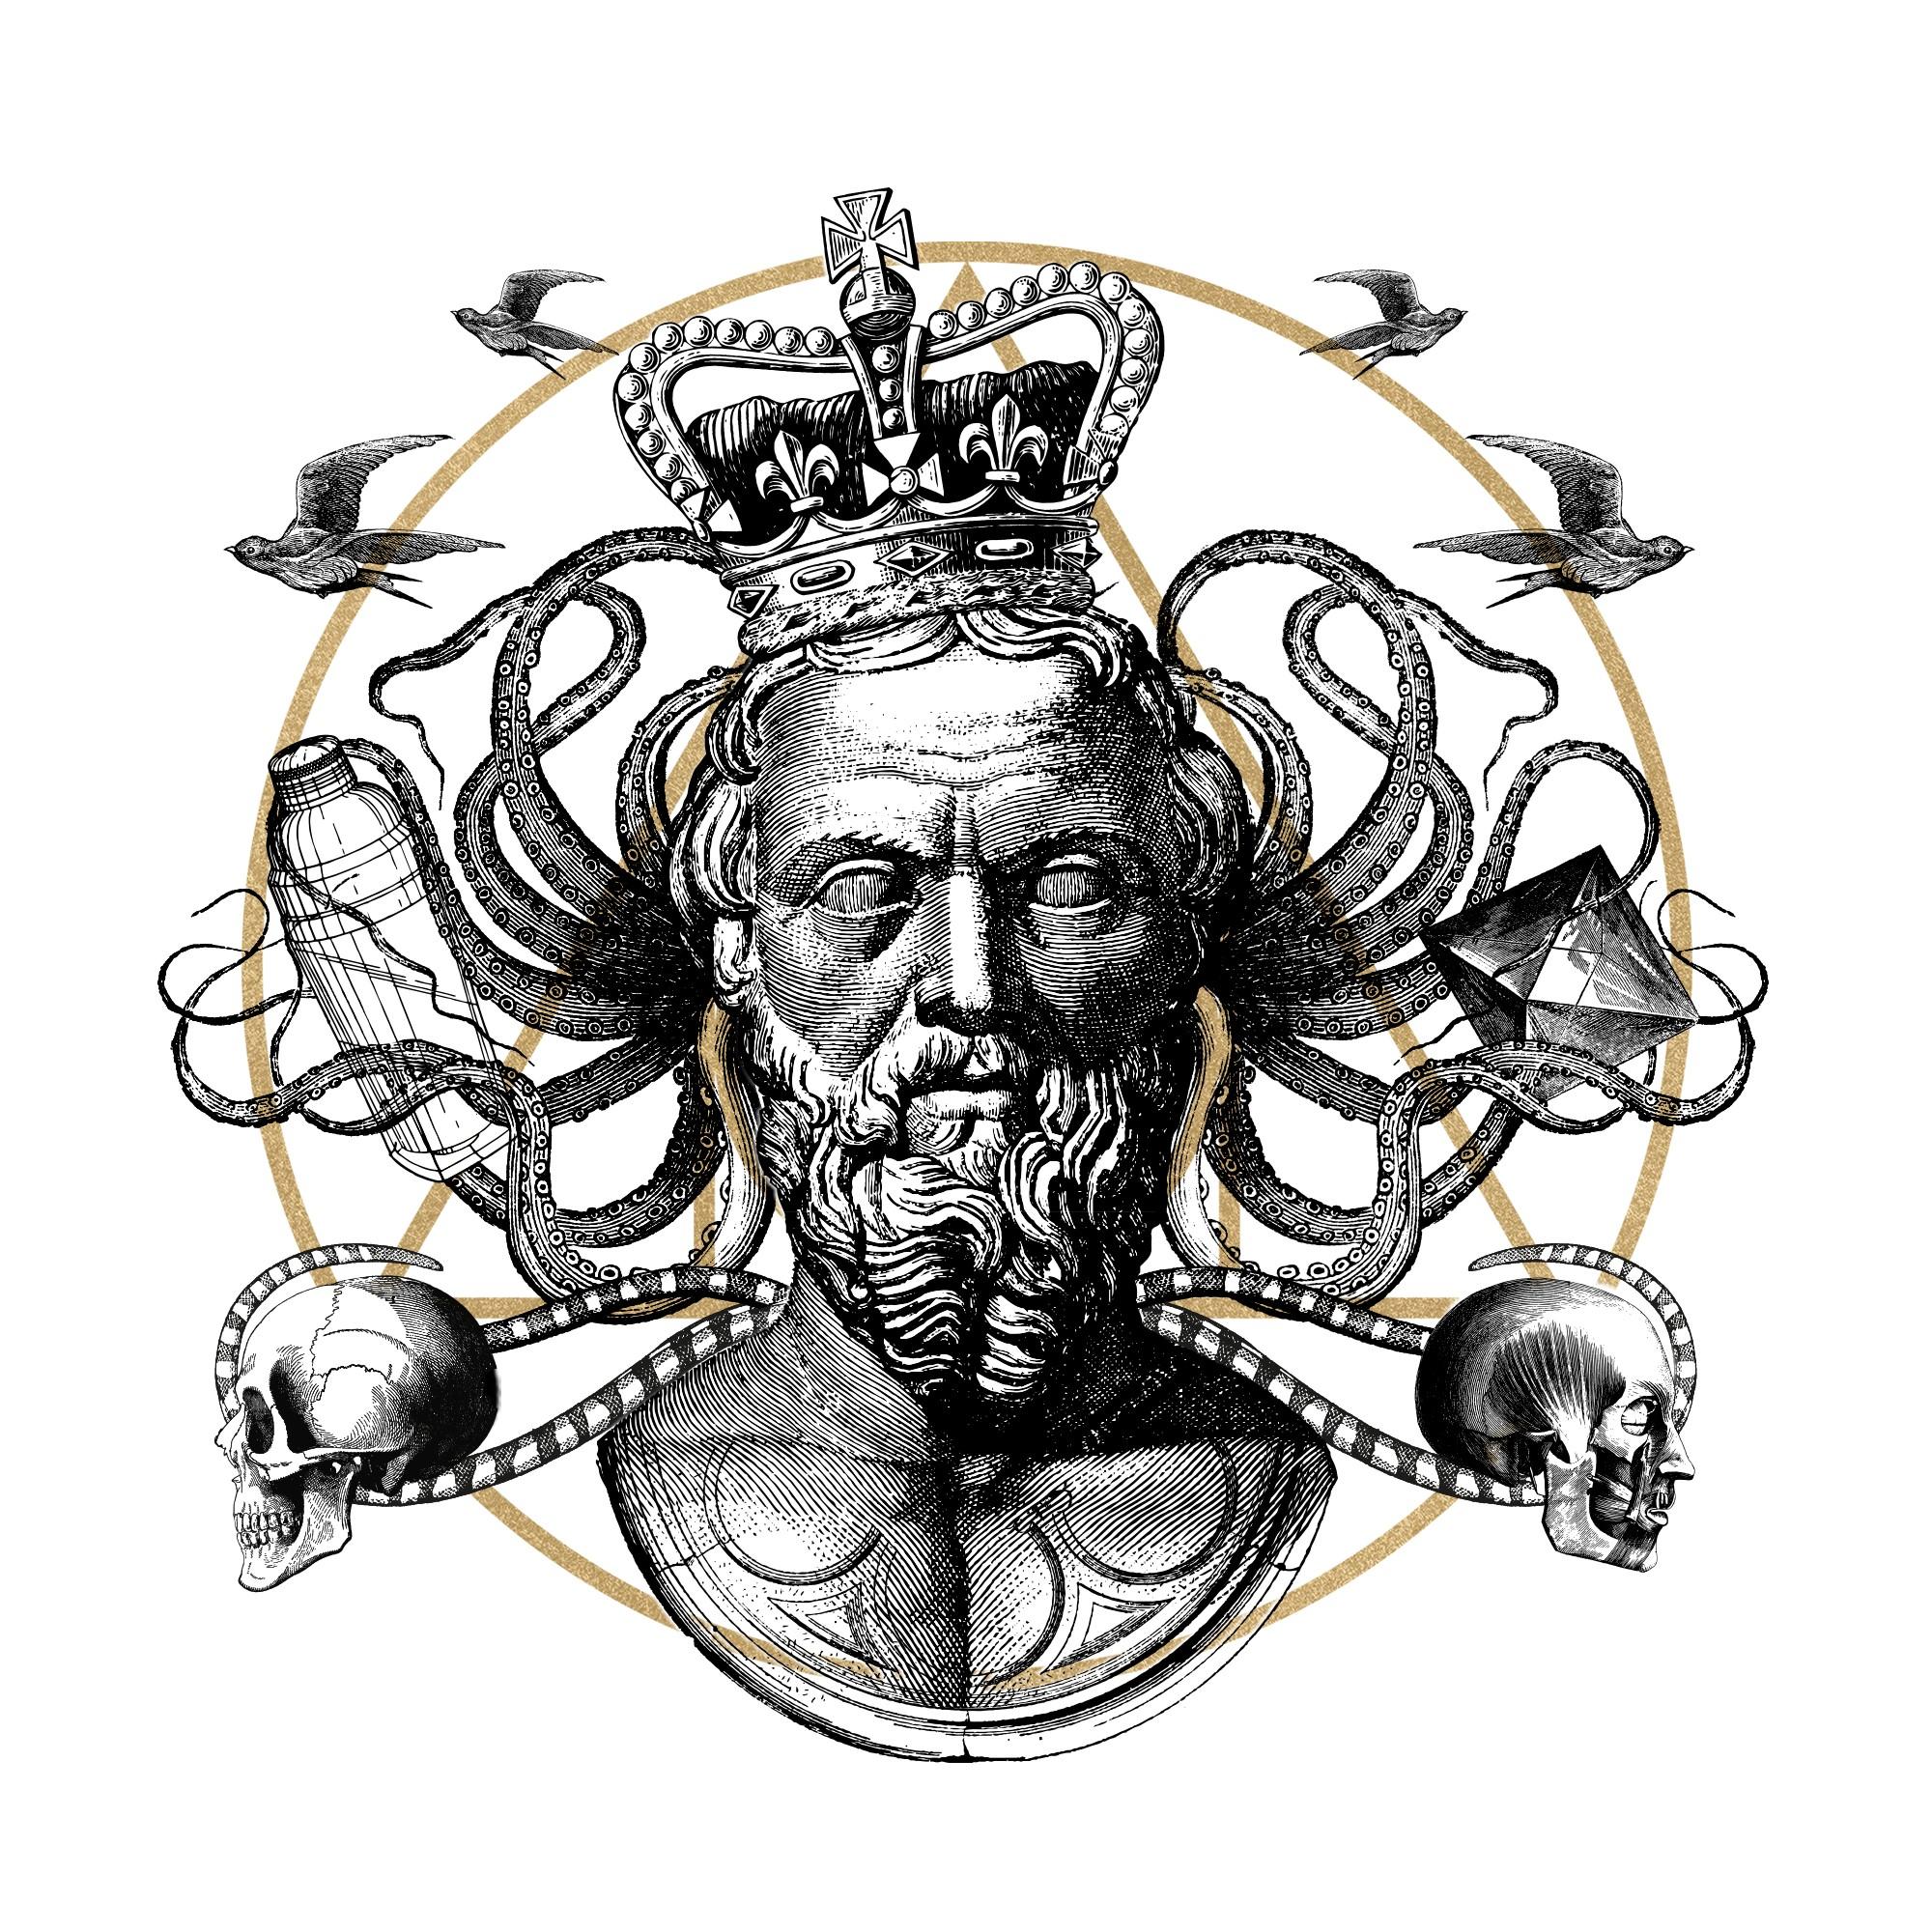 https://www.pro-manchester.co.uk/wp-content/uploads/2019/02/alchemist-logo.jpg